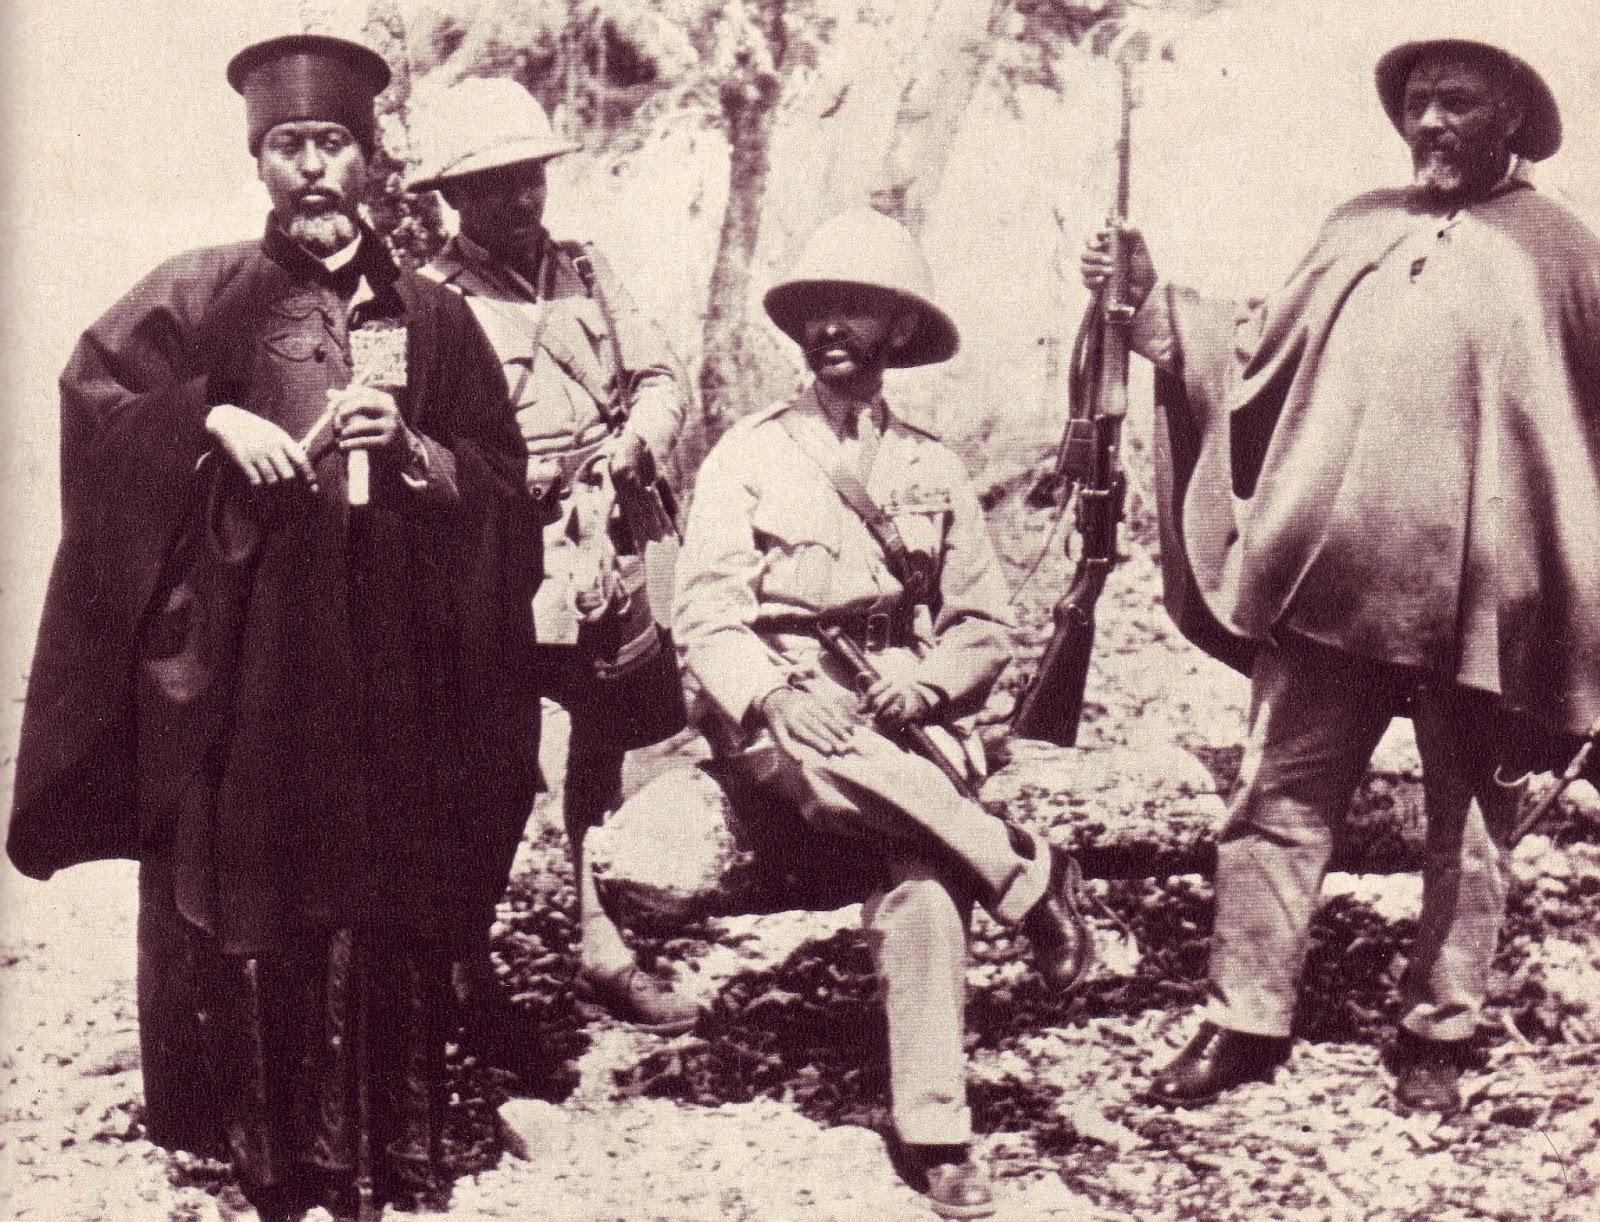 World War Two Daily: January 15, 1941: Haile Selassie Returns